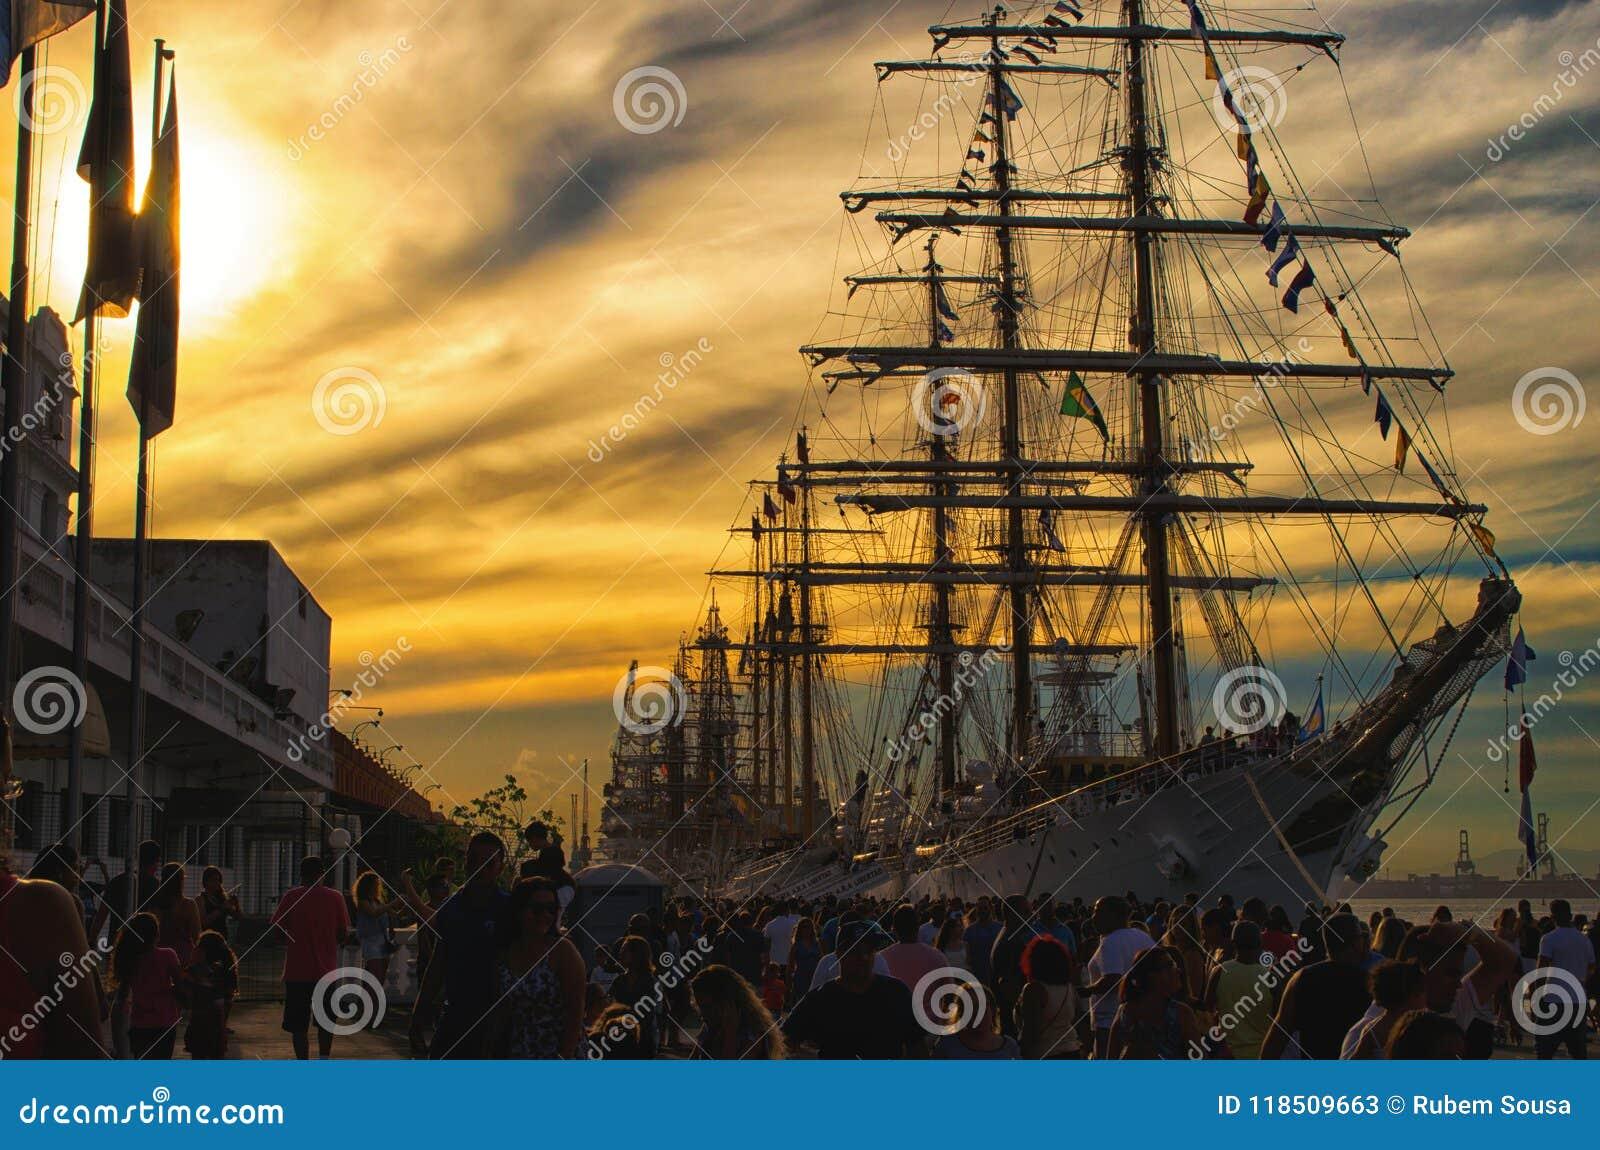 Velero en el embarcadero - Rio de Janeiro Brasil   Rubem Sousa Foros el Box®